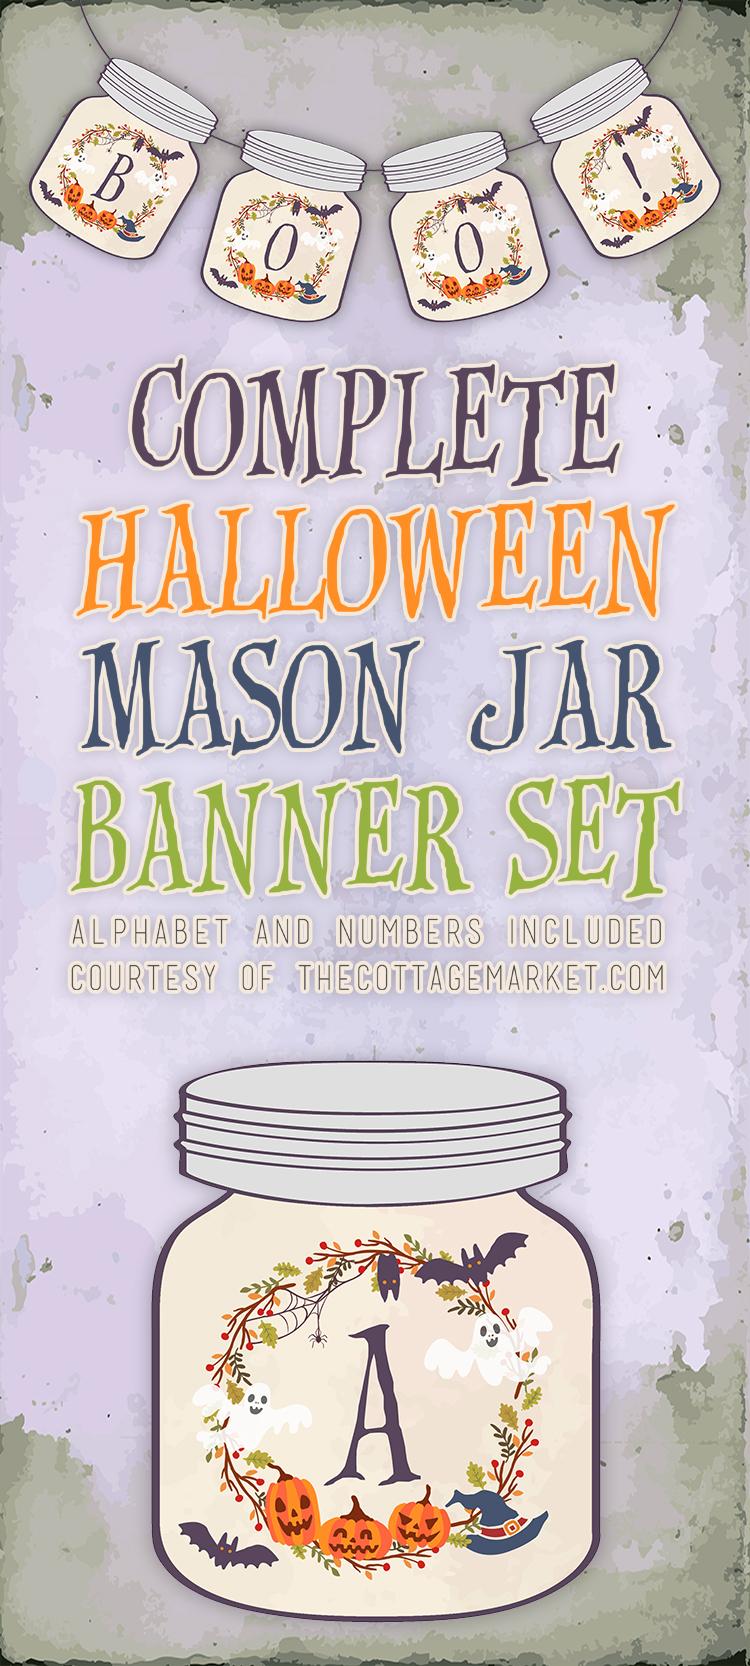 TCM-MasonJar-Halloween-Banner-Tower-2